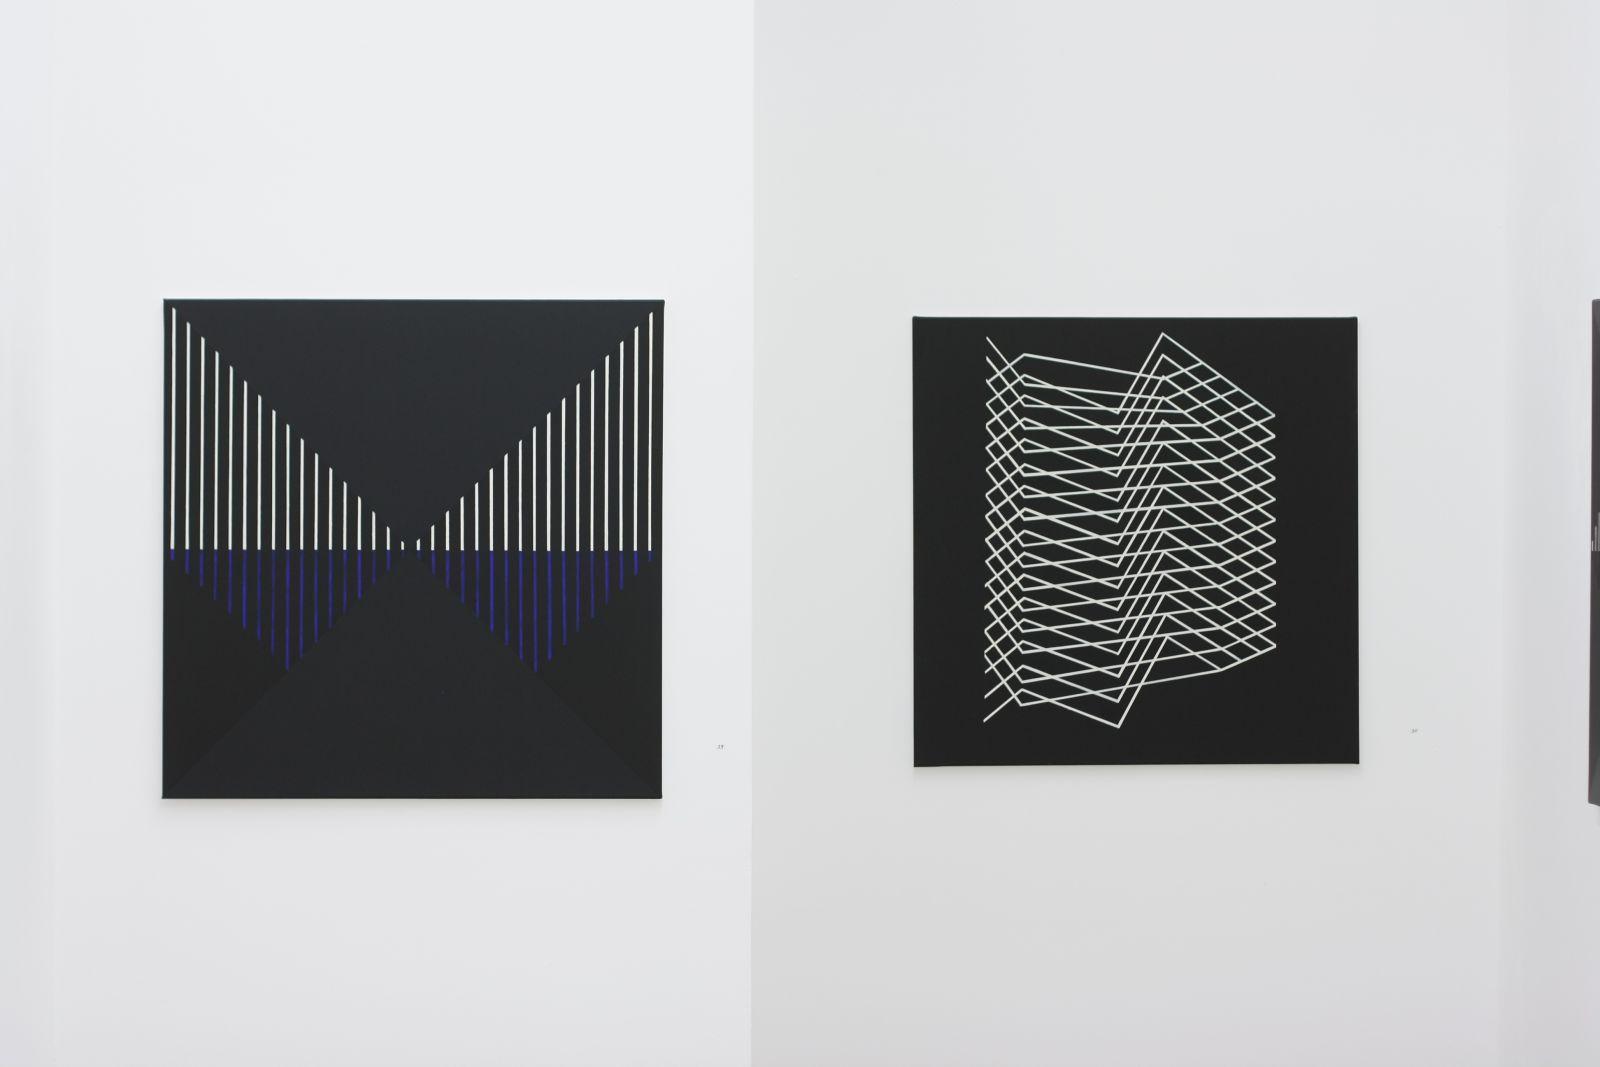 Ausstellungsansicht, art